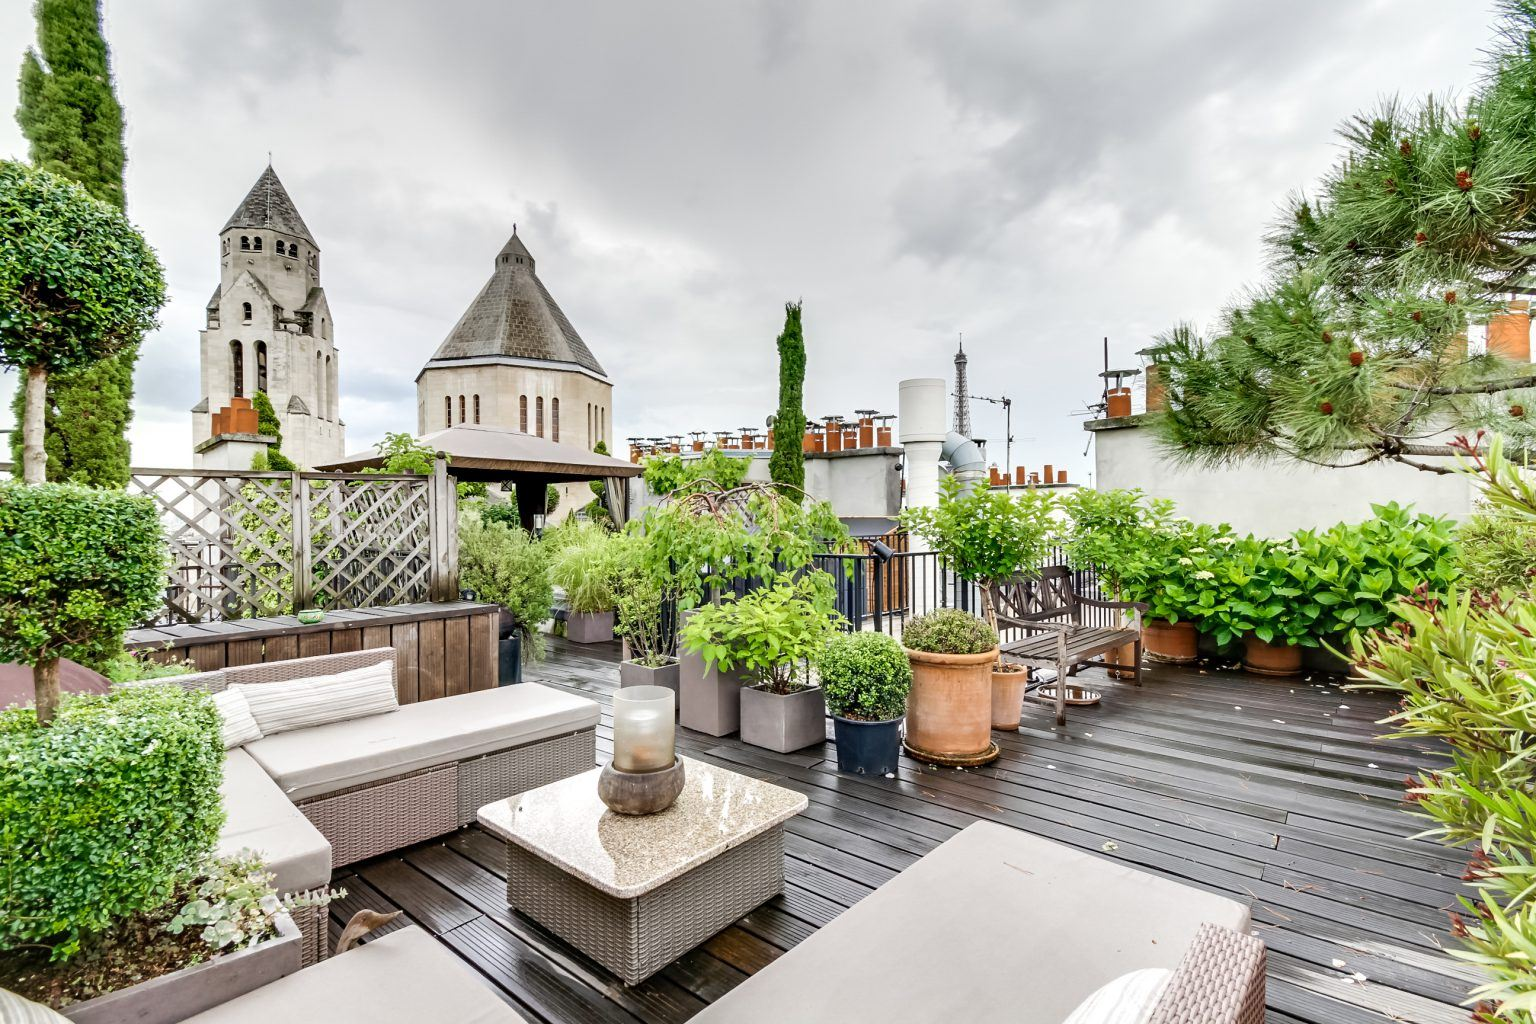 appart terrassse paris : BREXIT